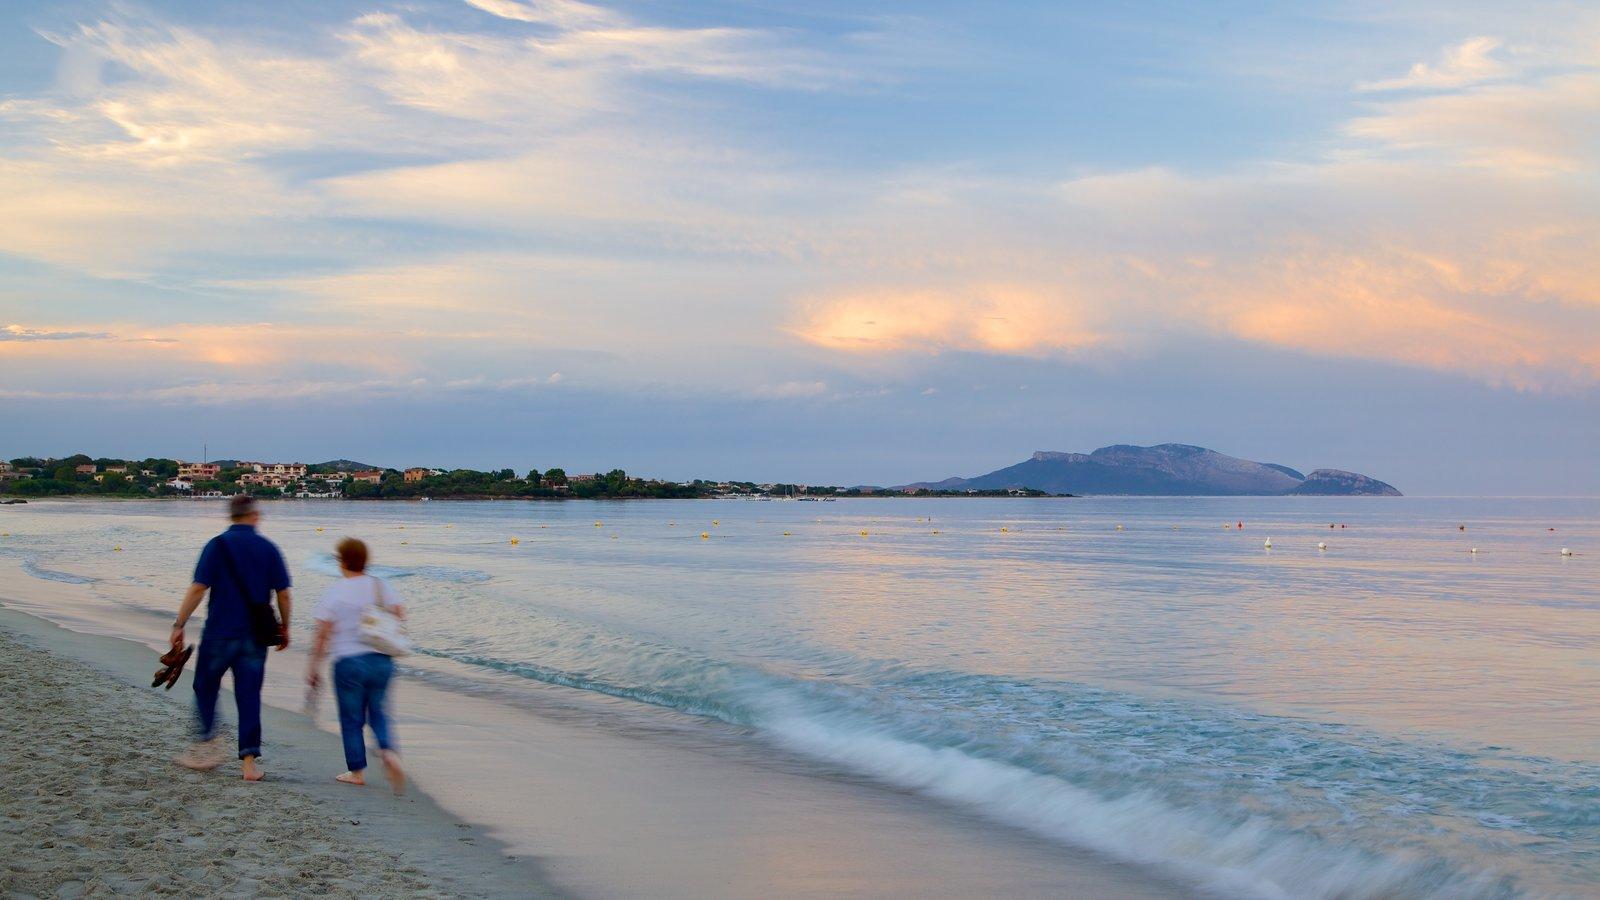 Pittulongu Beach featuring a sunset and a beach as well as a couple